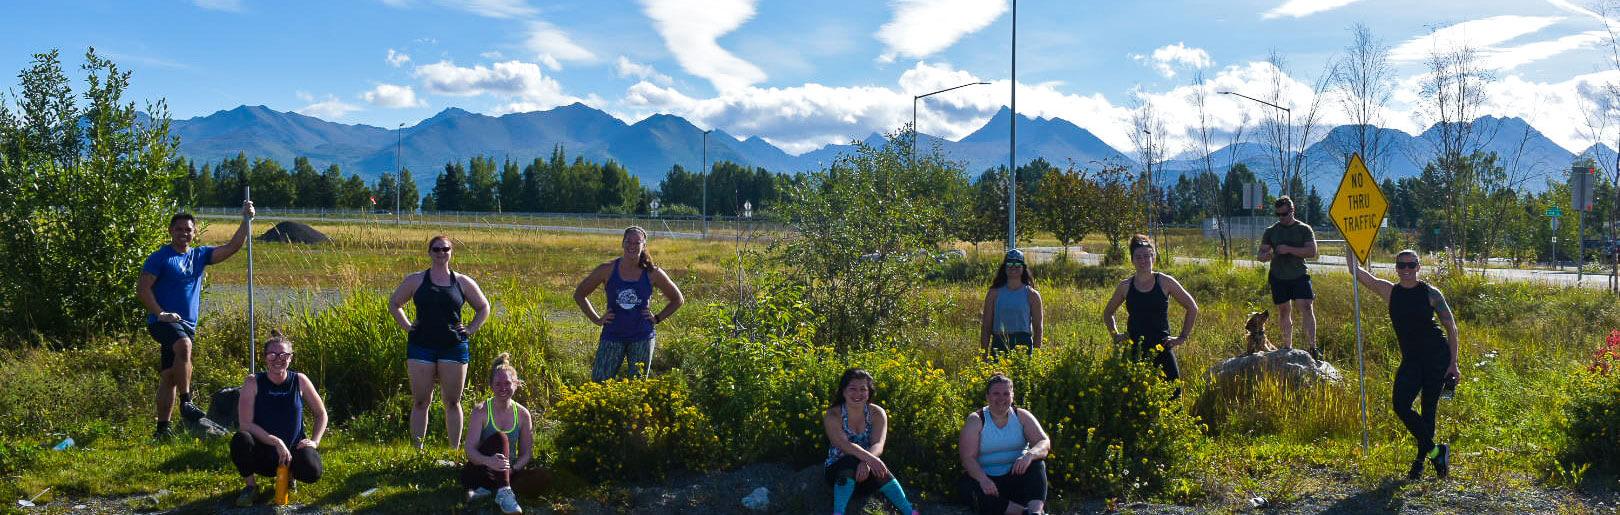 CrossFit Alaska members outdoors after a hard workout.